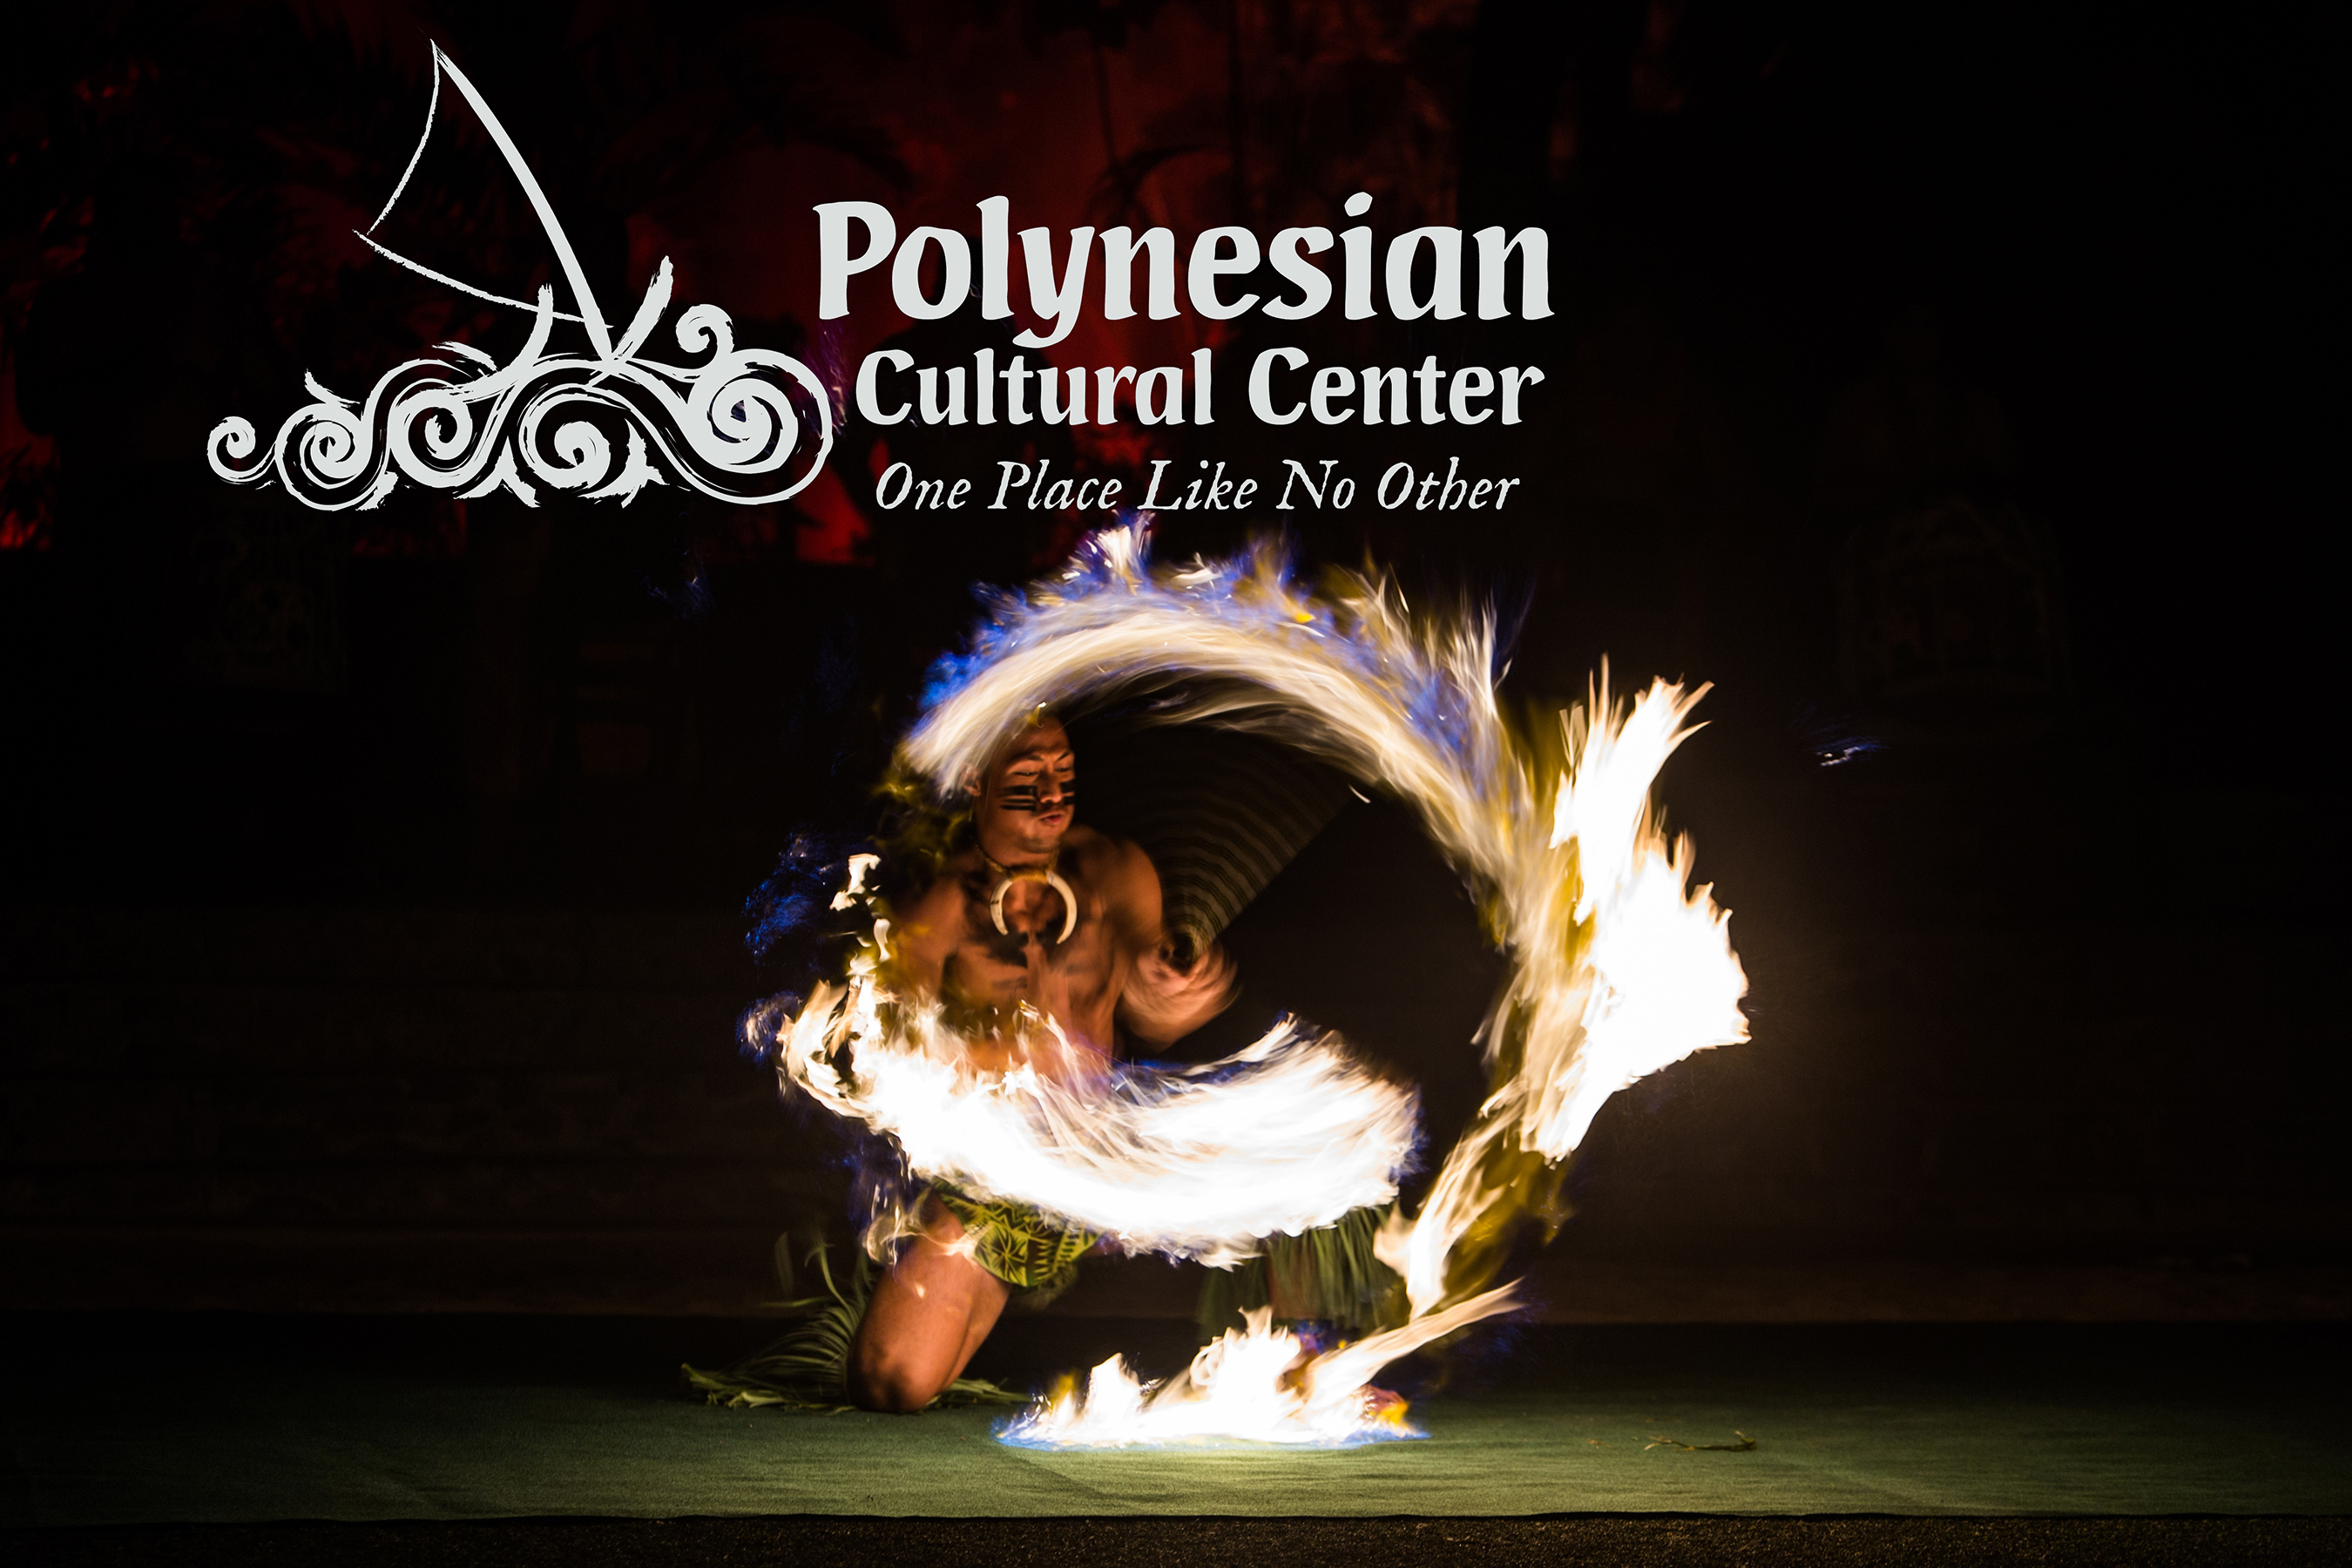 Samoa's Falaniko Penesa Crowned World's Hottest Winner at 25th Annual World Fireknife Championship